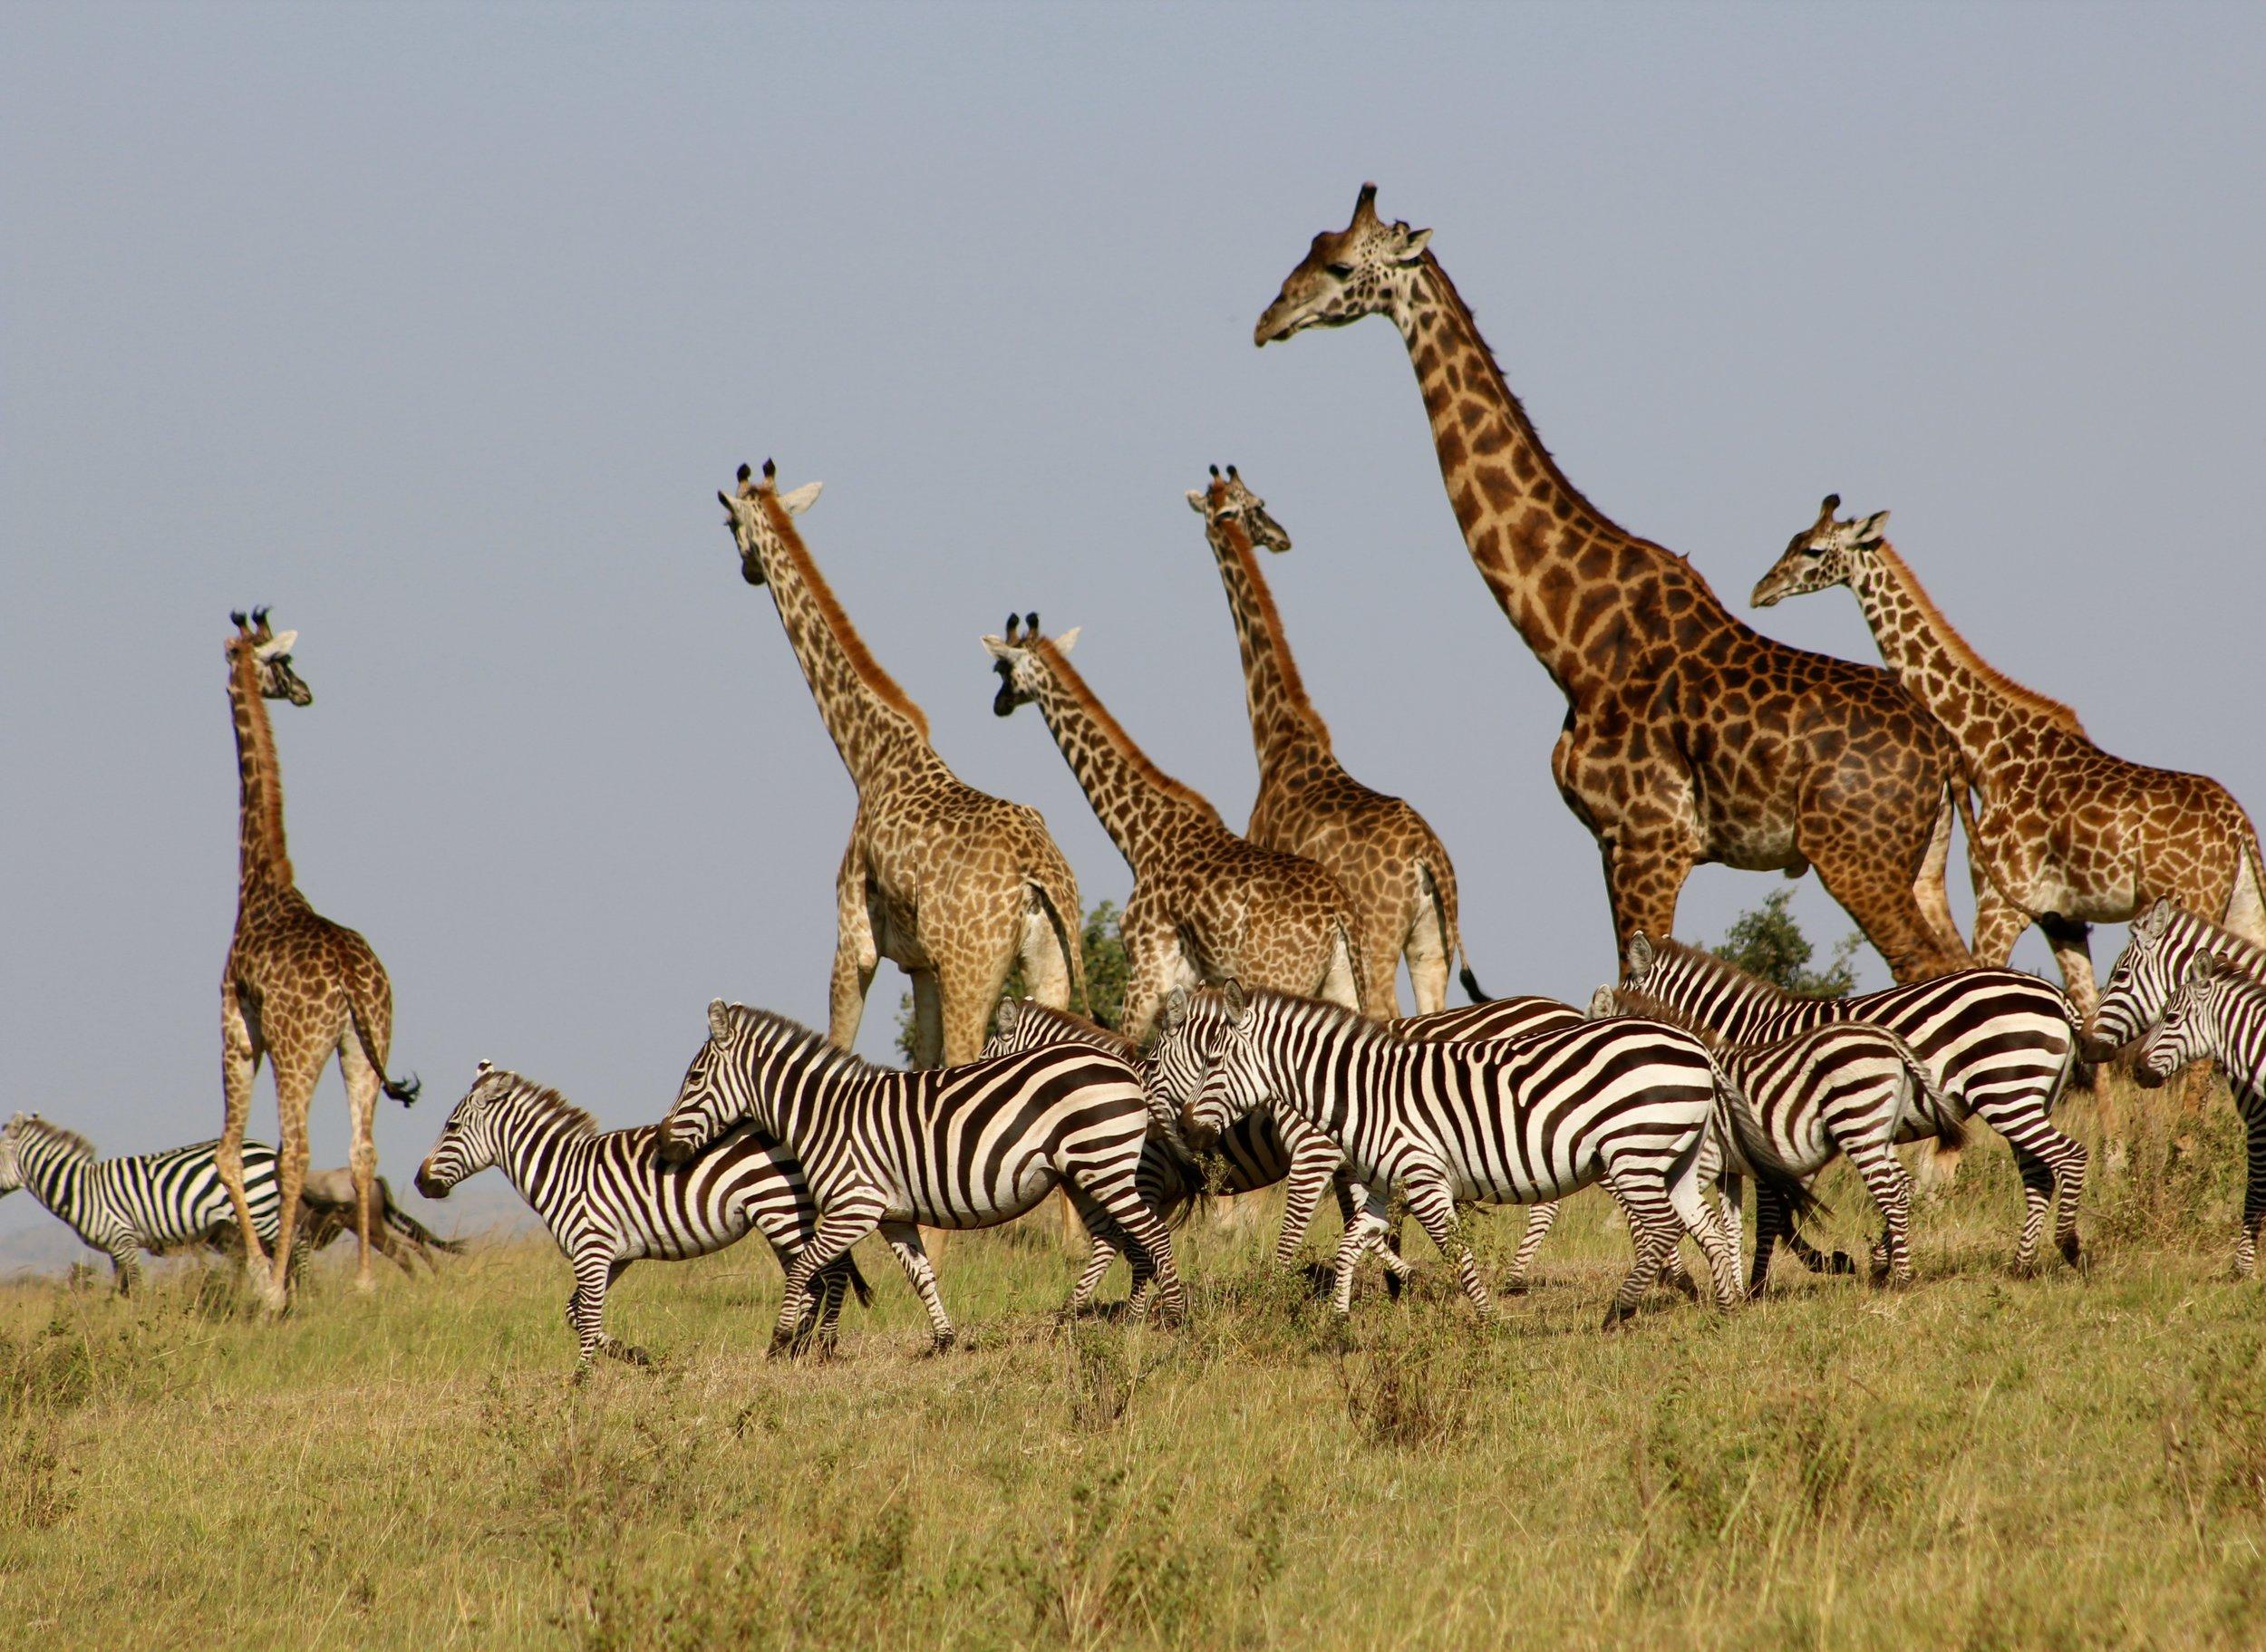 Maasai Mara, Kenya. Photo by  Heather M. Edwards  on  Unsplash